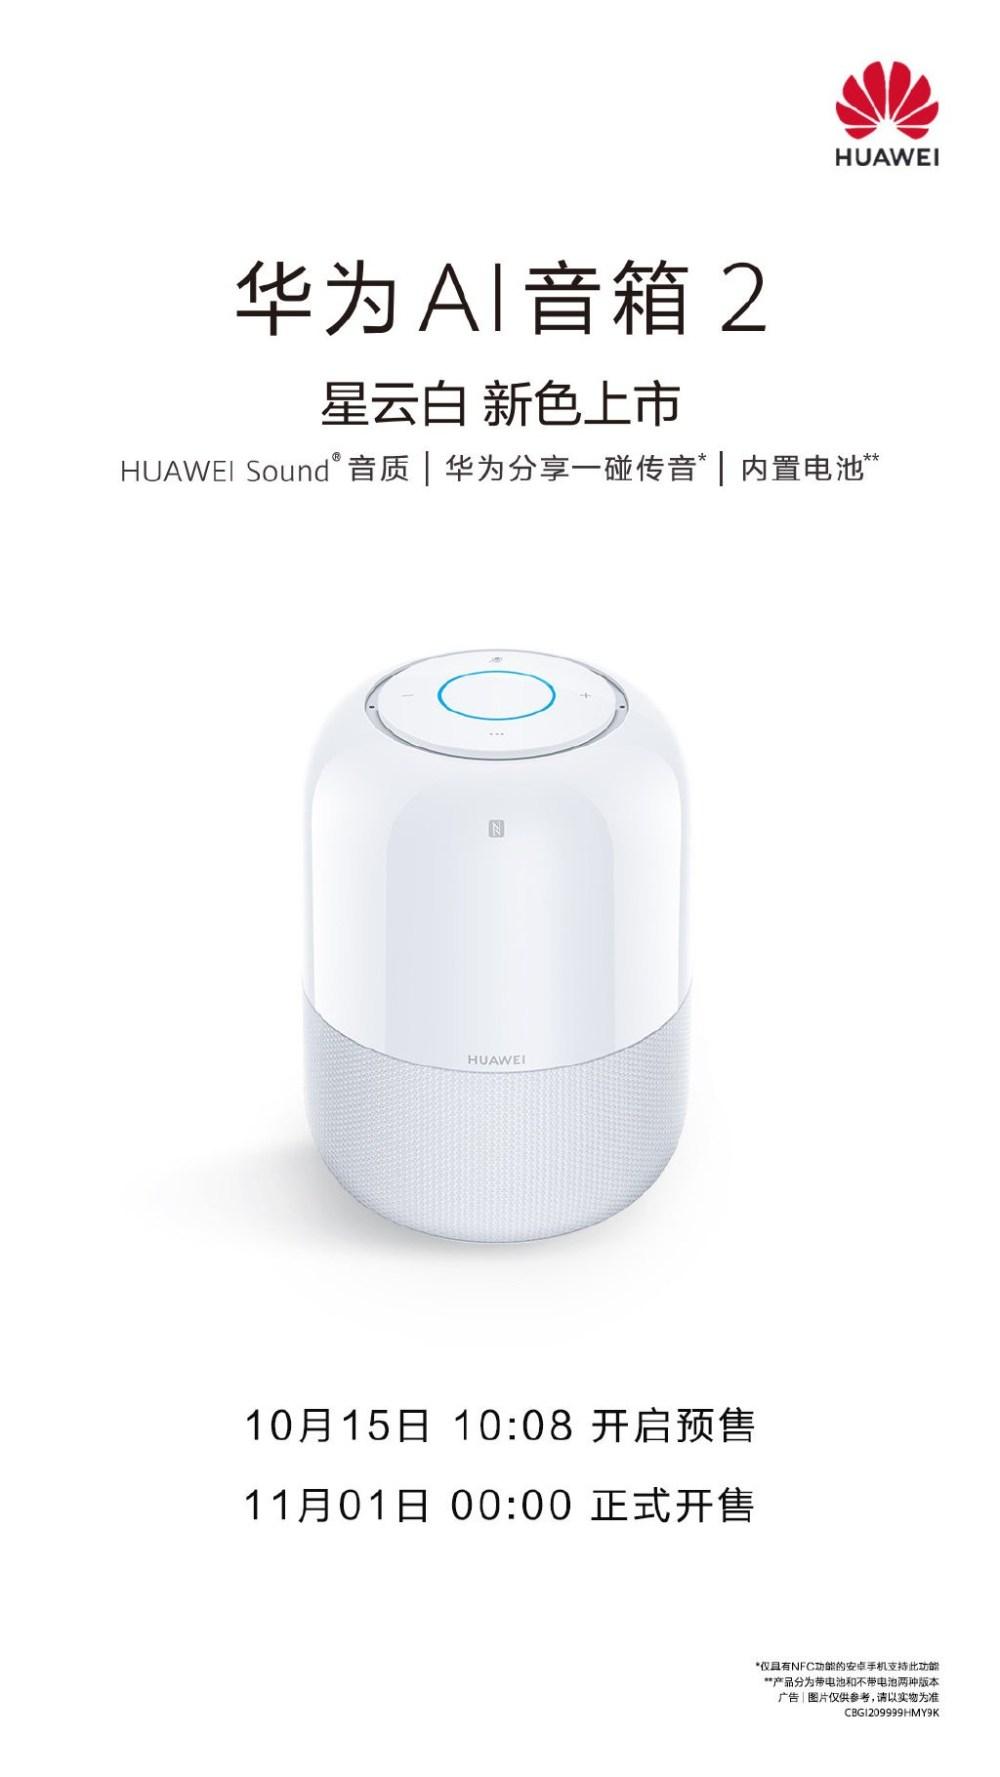 Huawei AI Speaker 2 Image